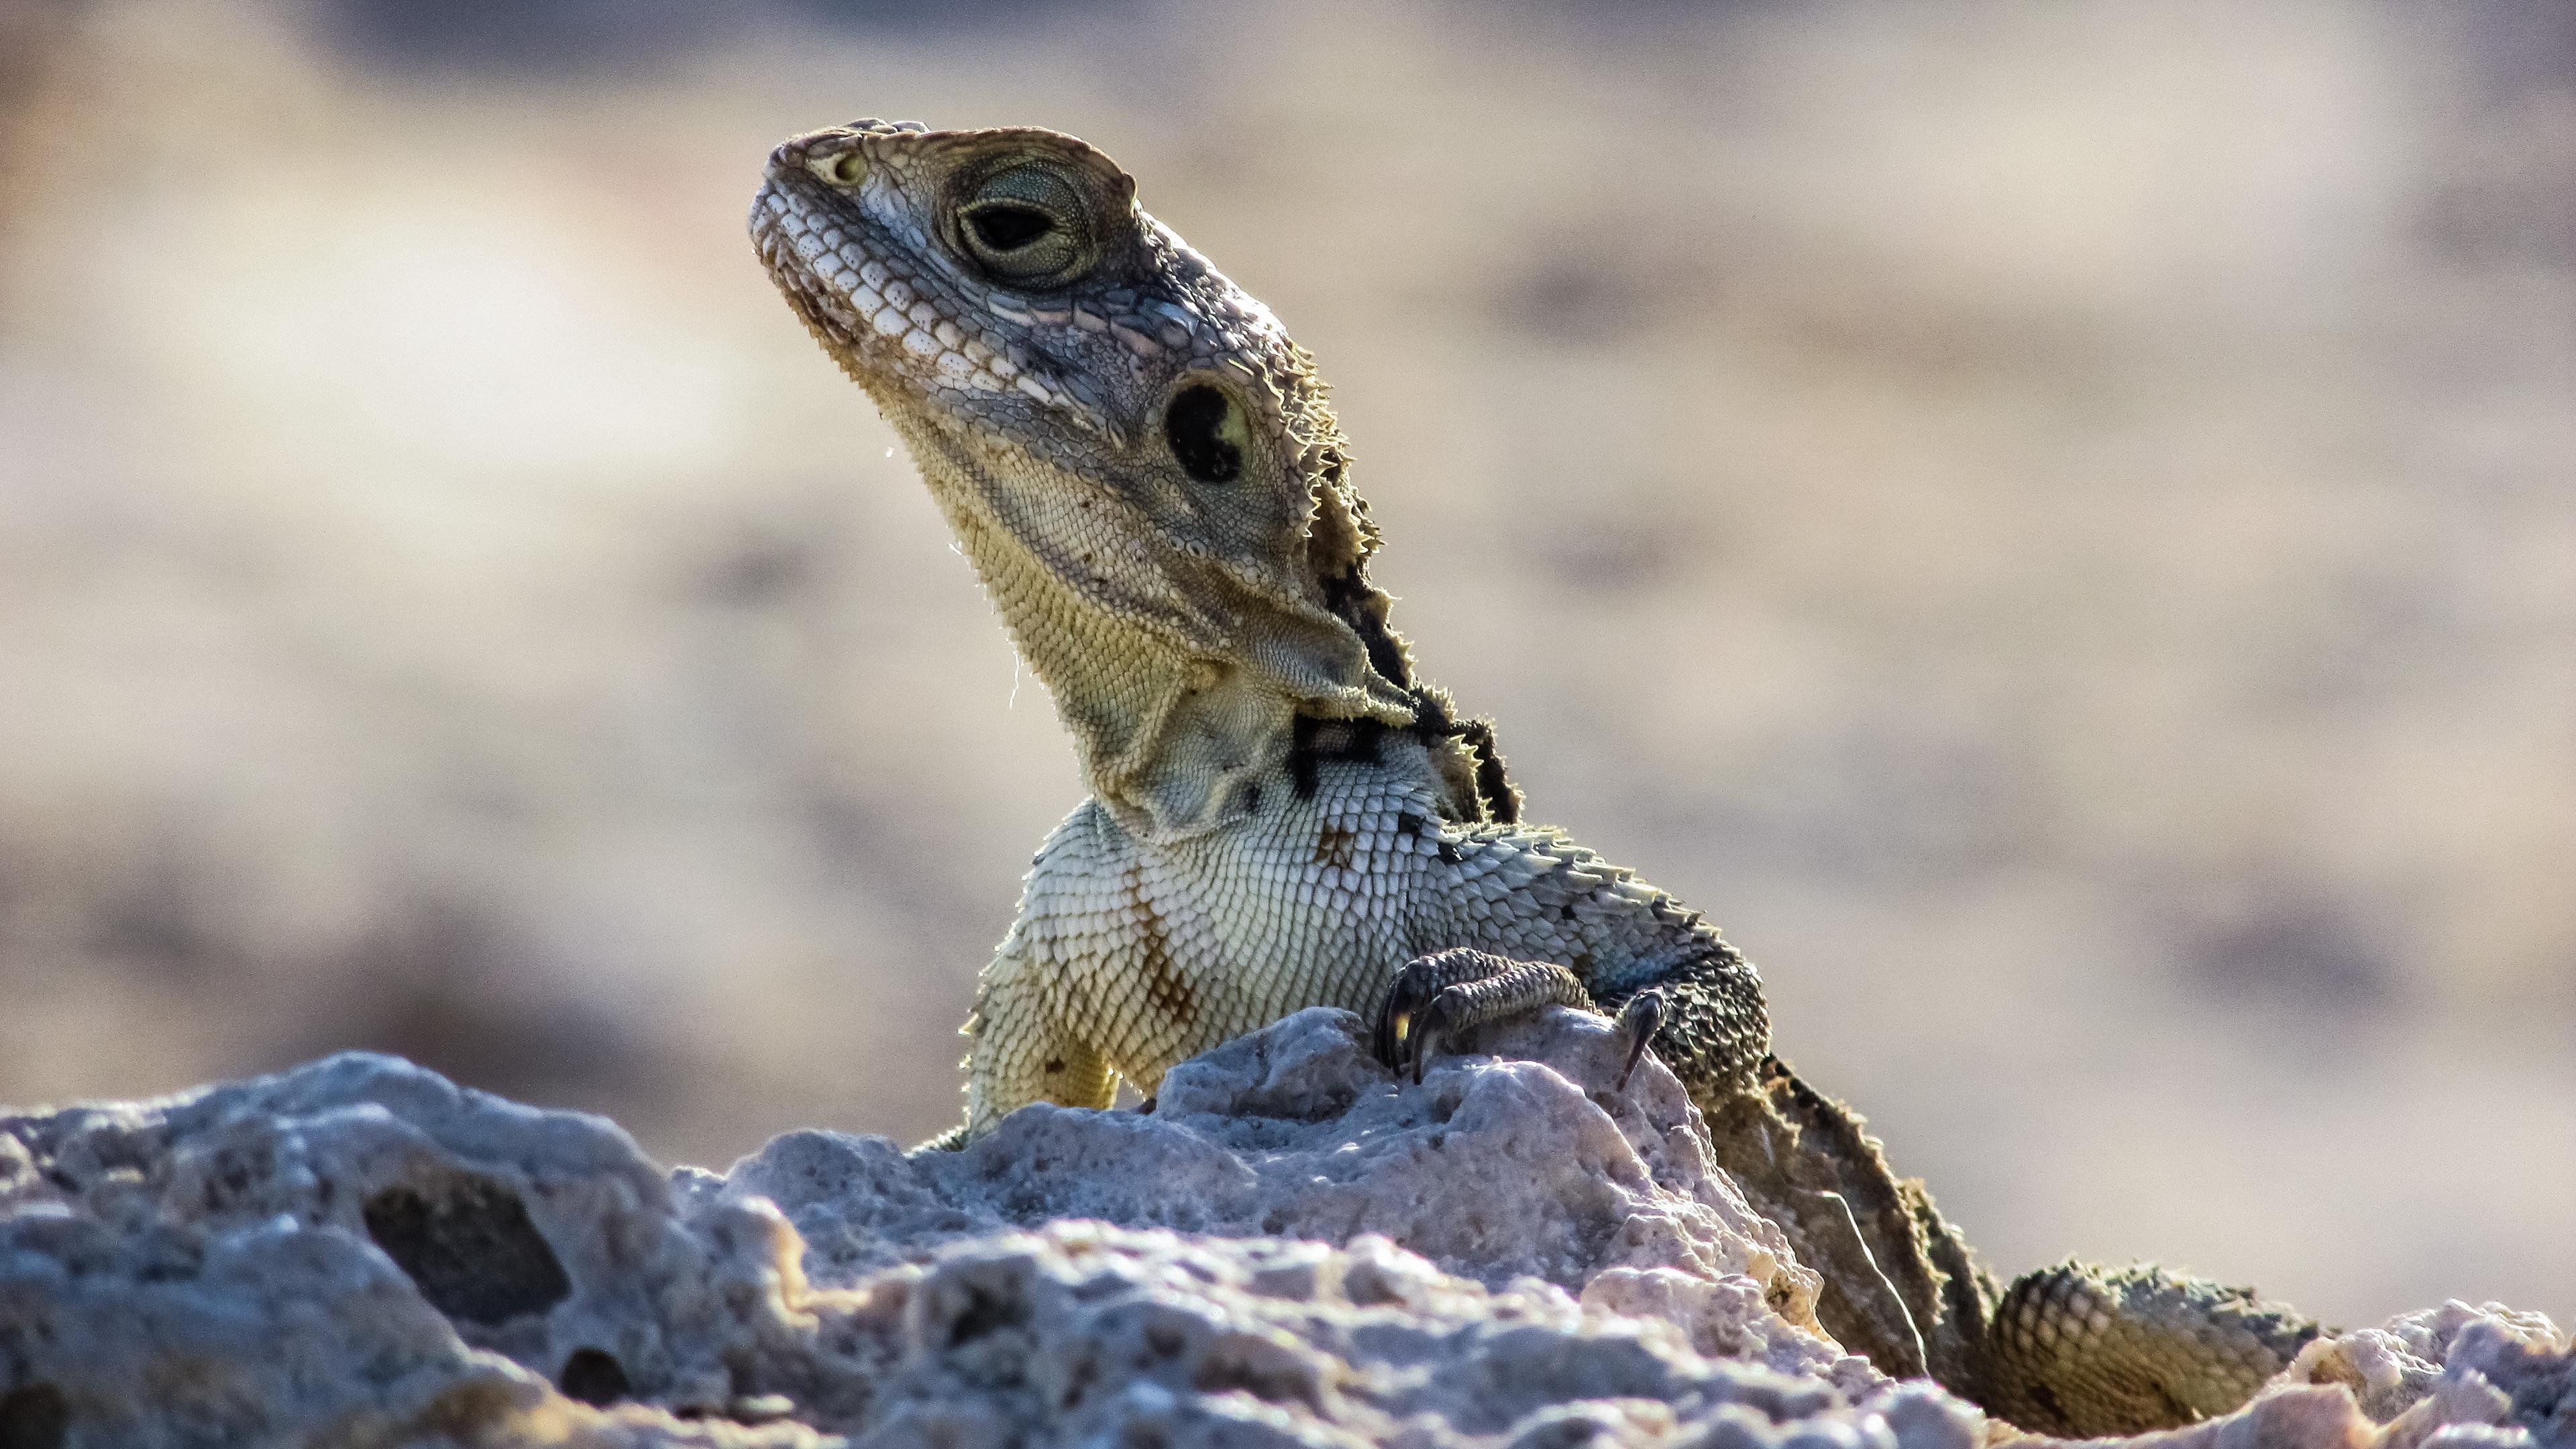 lizard reptile head stones 4k 1542242726 - lizard, reptile, head, stones 4k - reptile, Lizard, Head